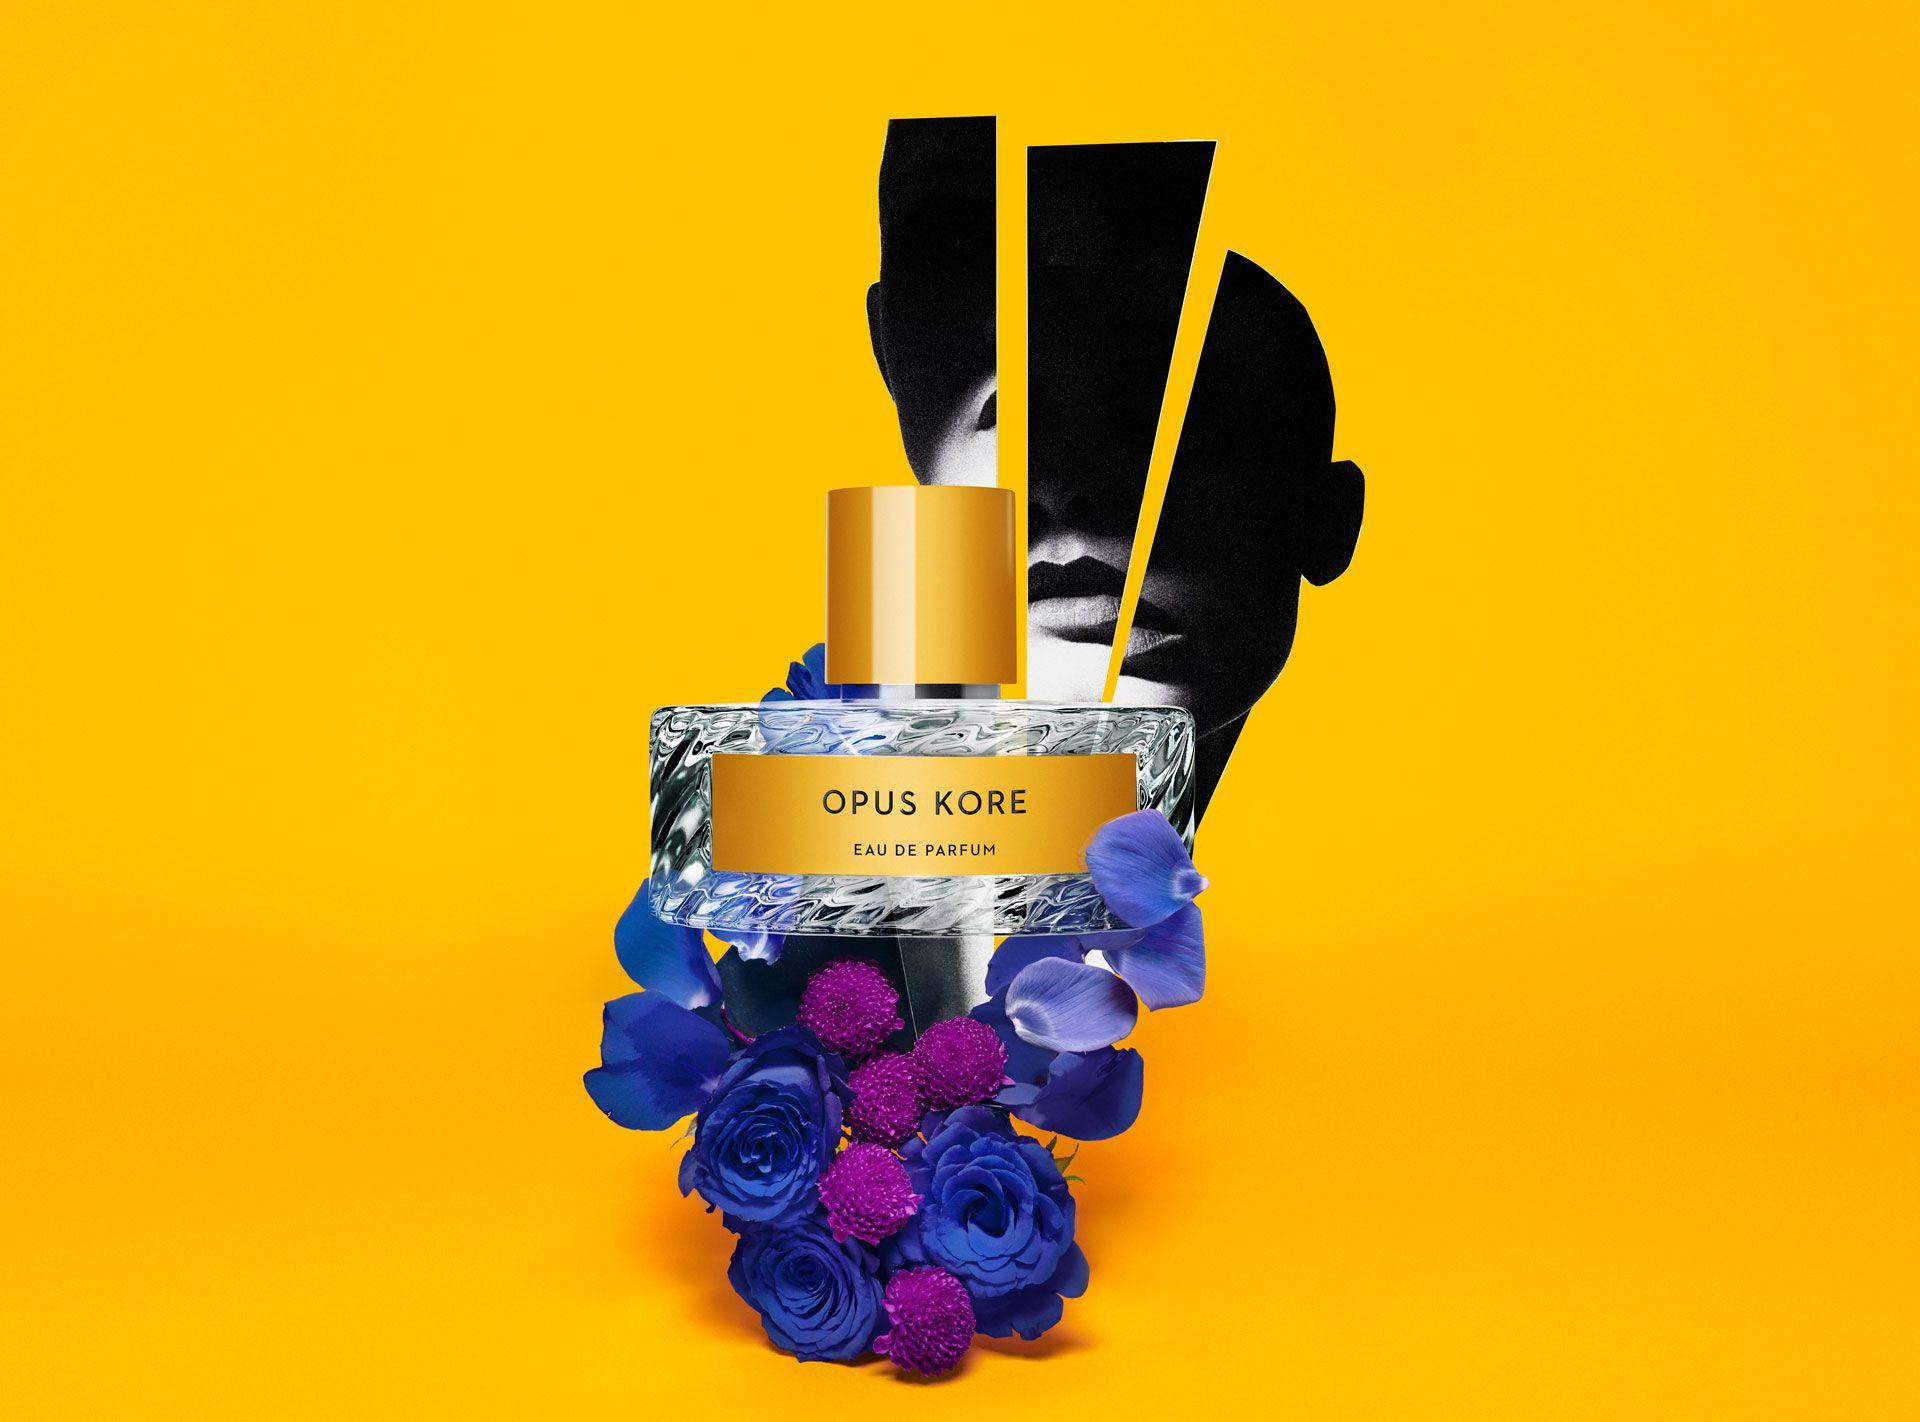 Kết quả hình ảnh cho OPUS KORE vilhelm parfumerie